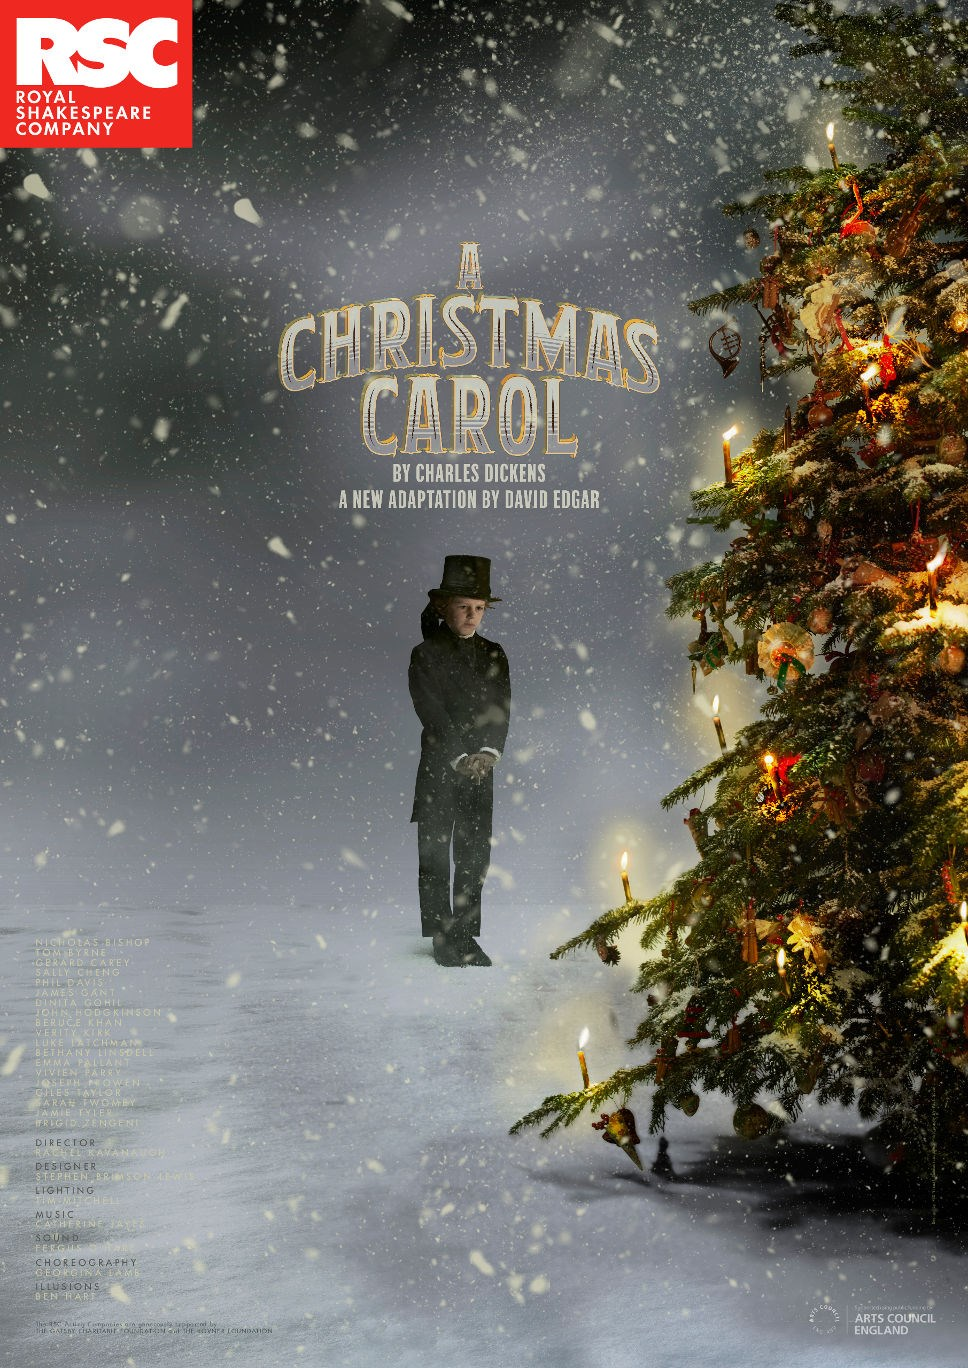 30206-a-christmas-carol-poster-2017-normal.jpg